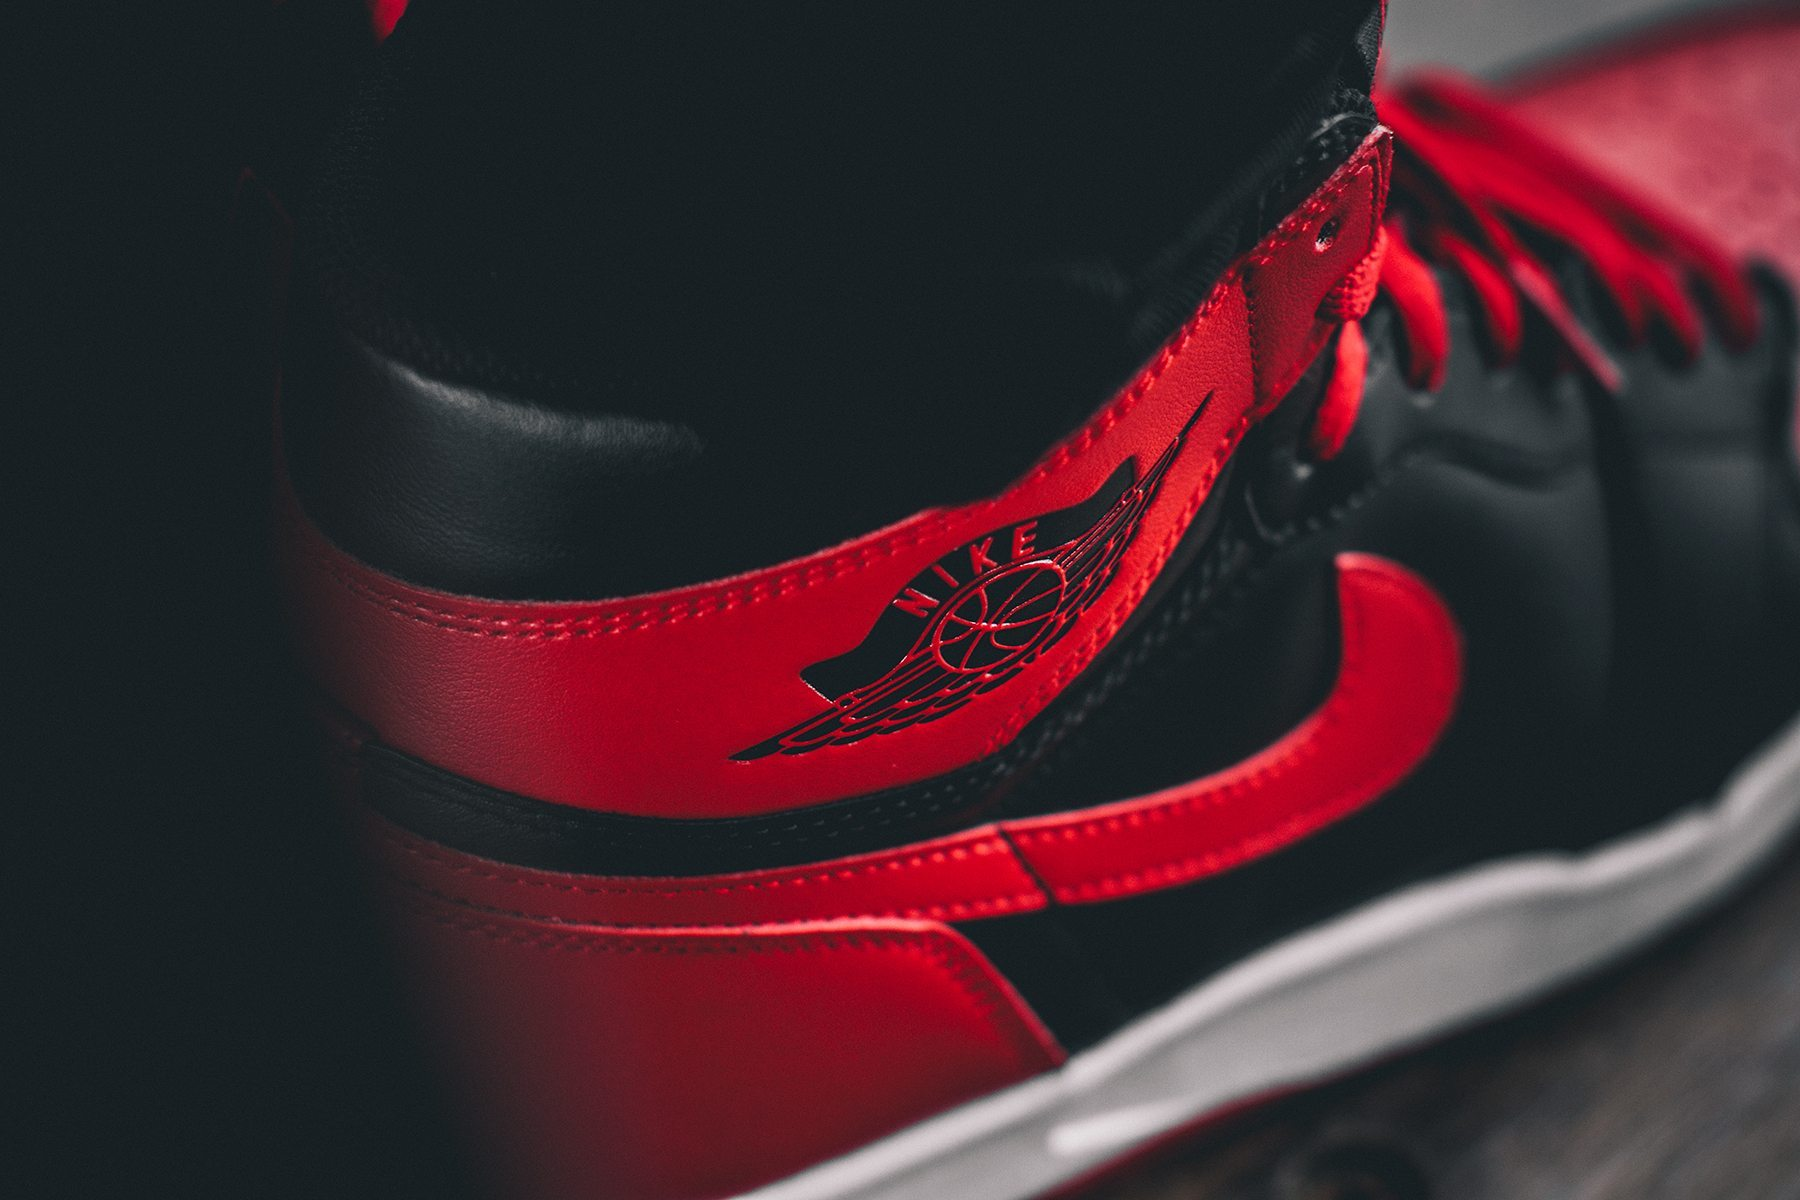 Air Jordan 1 Retro High Bred 5